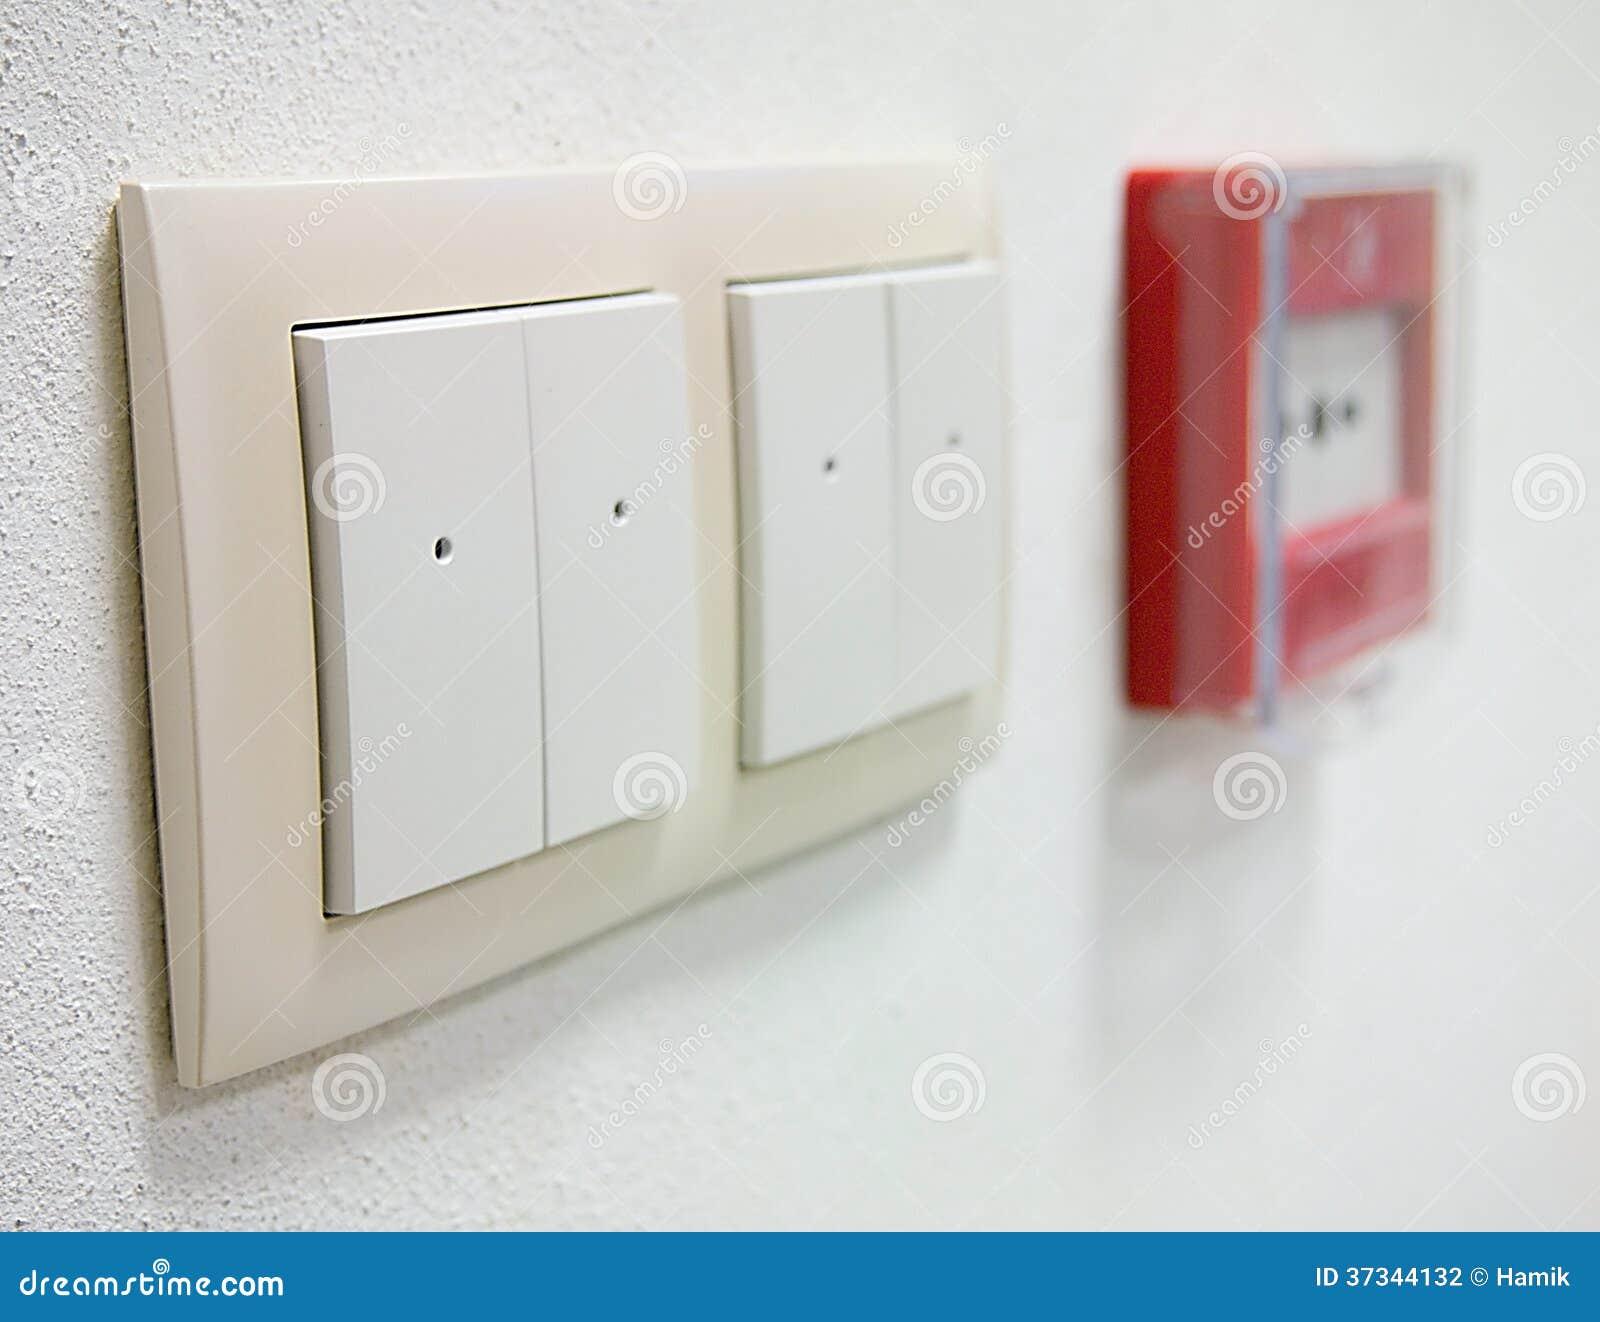 Interrupteur de lampe